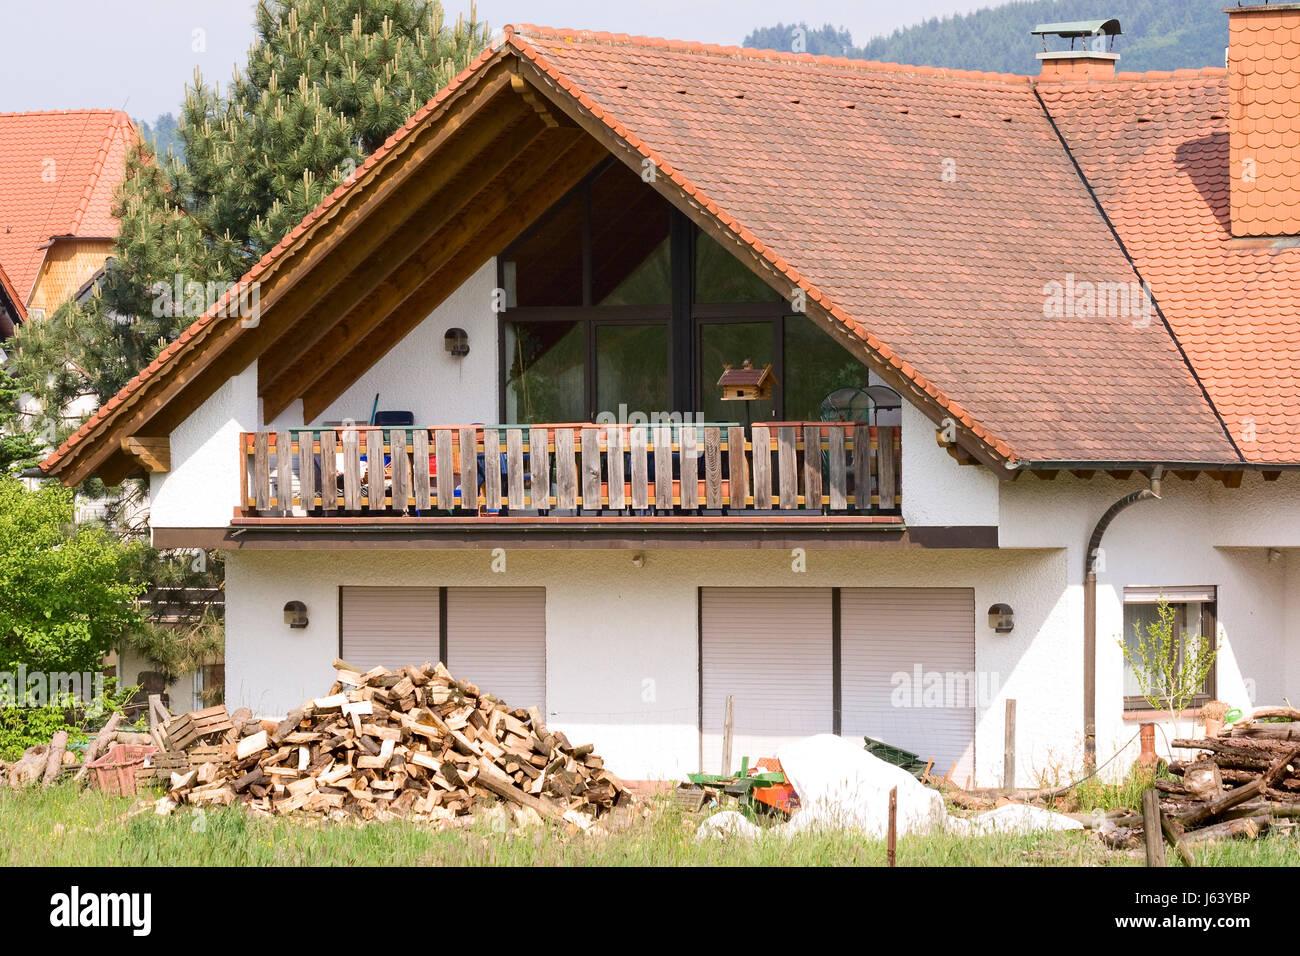 Haus Haus Wohnhaus Wohnhaus bauen Holz Bungalow Brennholz Stockfoto ...